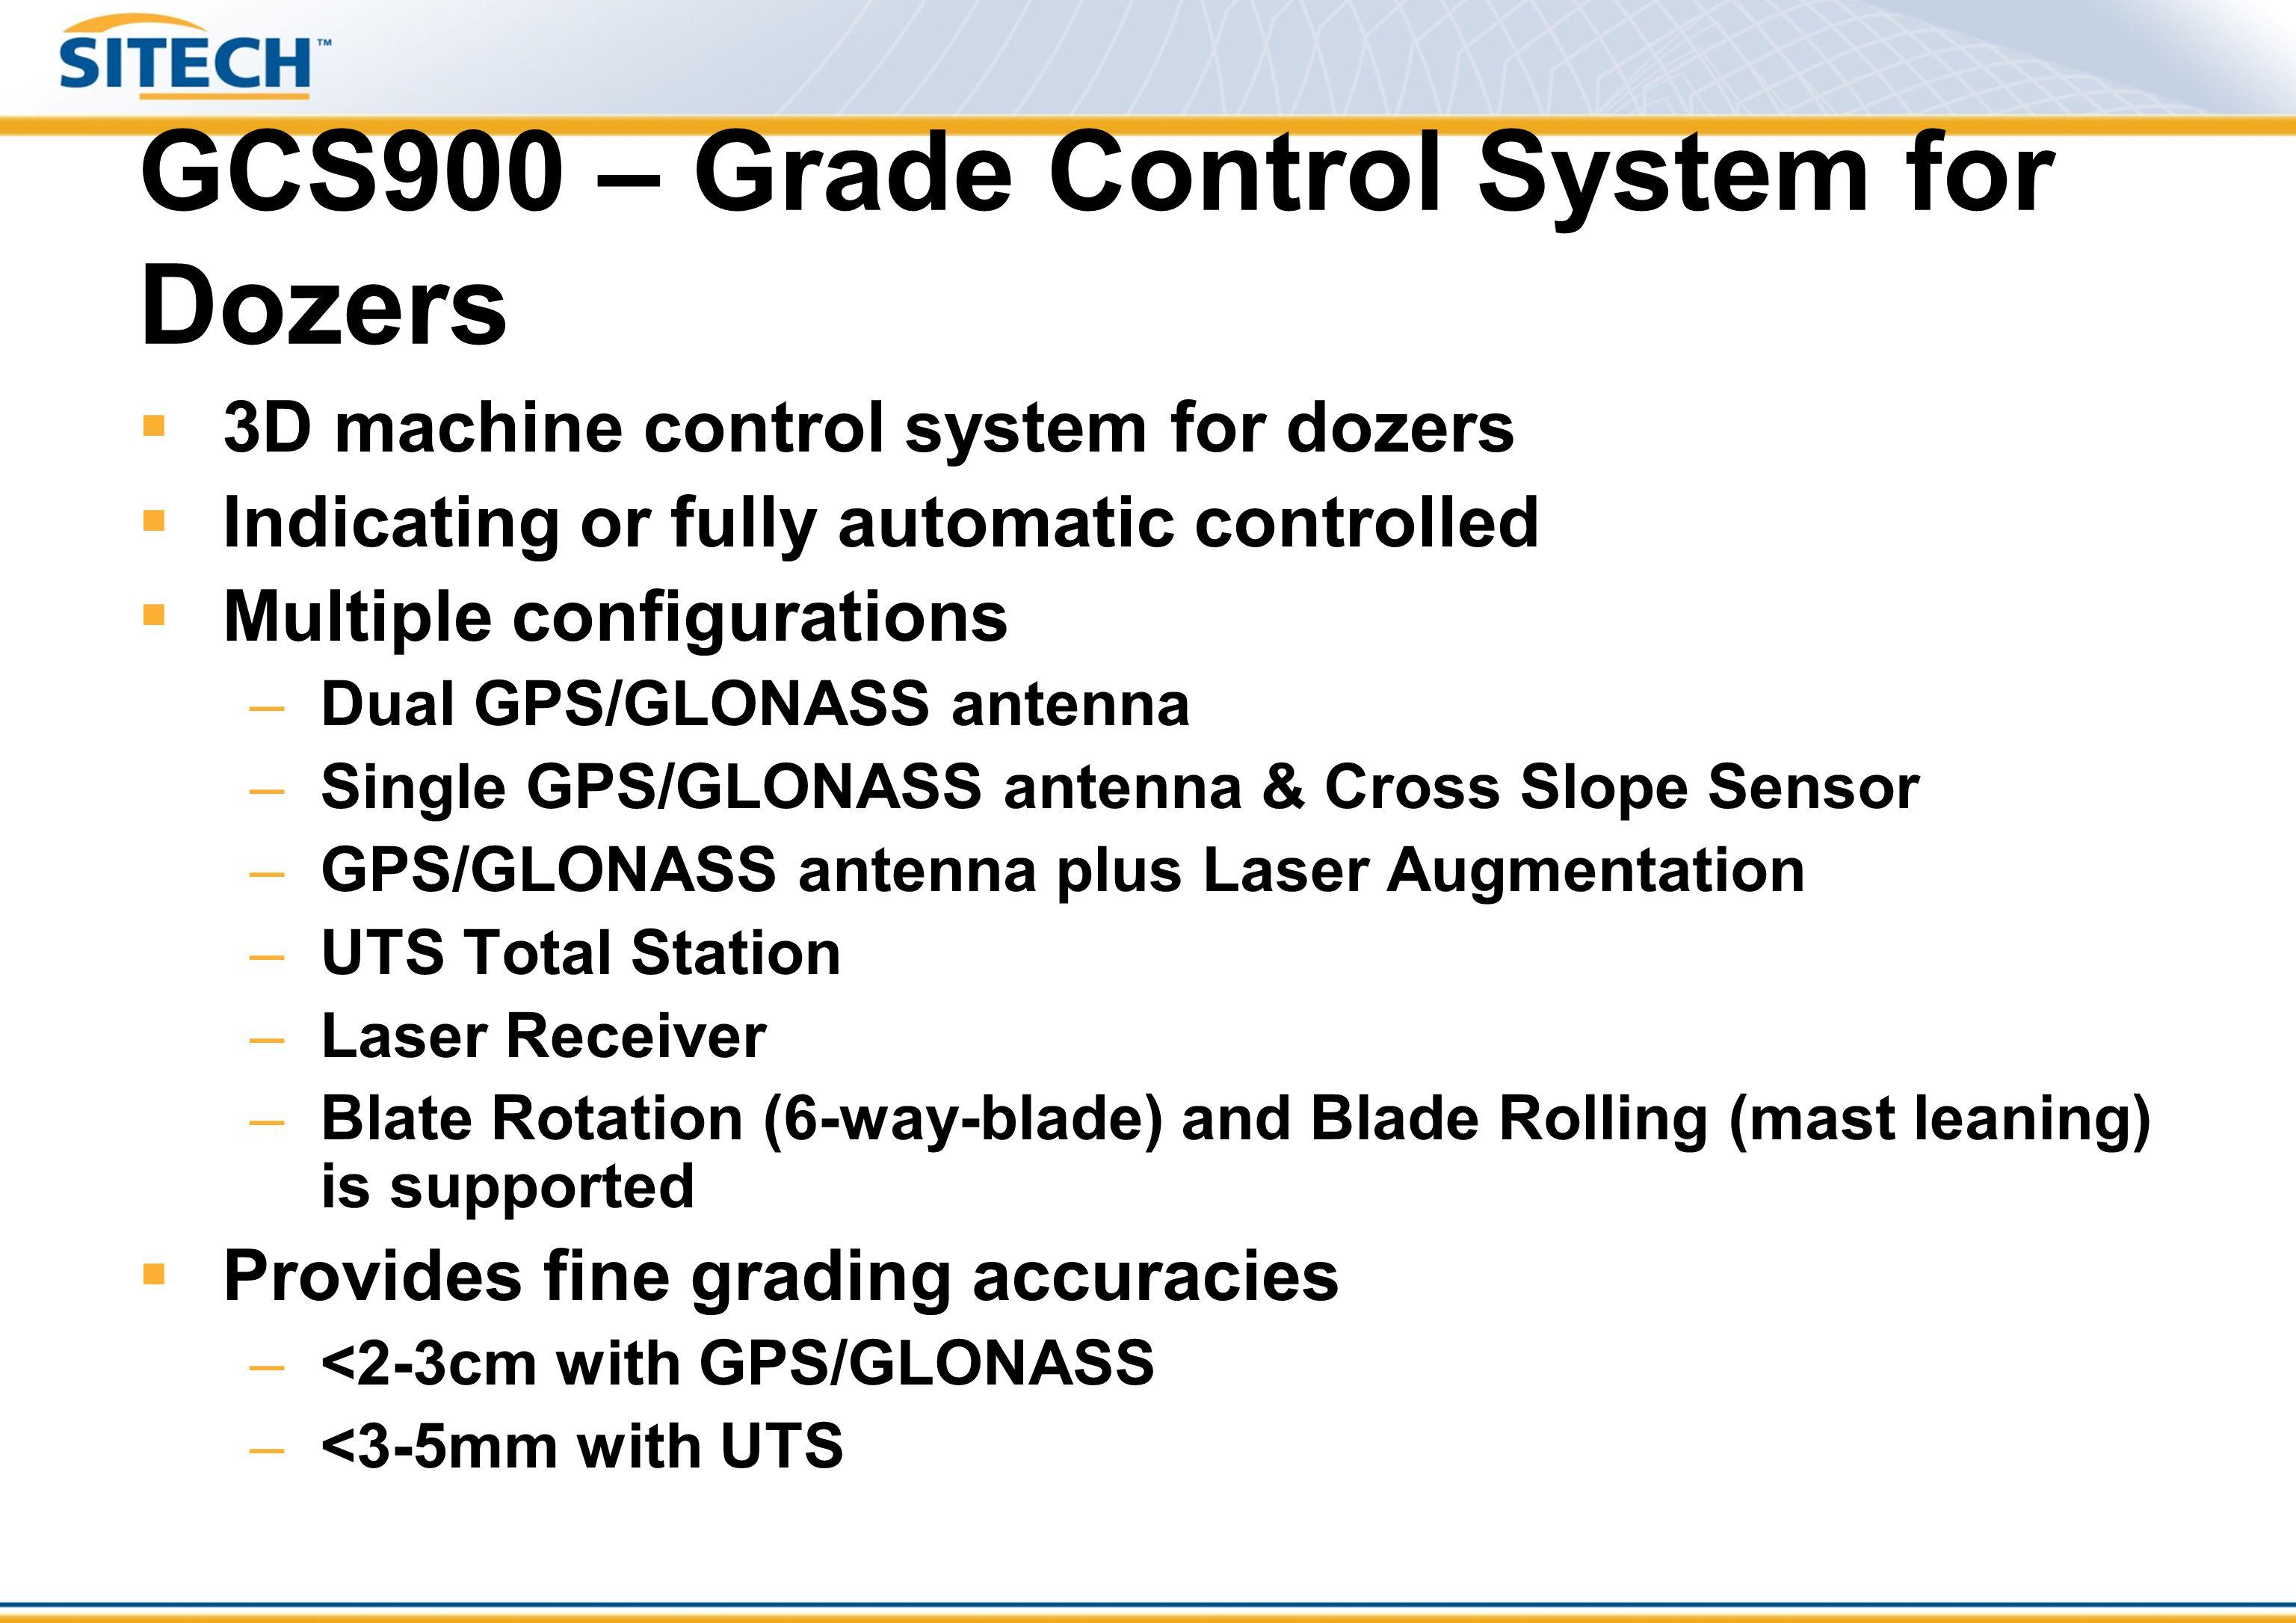 Trimble GCS900: 3D Excavator - Dual GNSS Boom AS450 Bucket AS450 Stick AS450 Tilt-bucket AS450 (optional) Platform AS21-2 Rototilt AS455 (optional) Harness Dual MS9X0 SNRCB430 LB400 SNM930 or